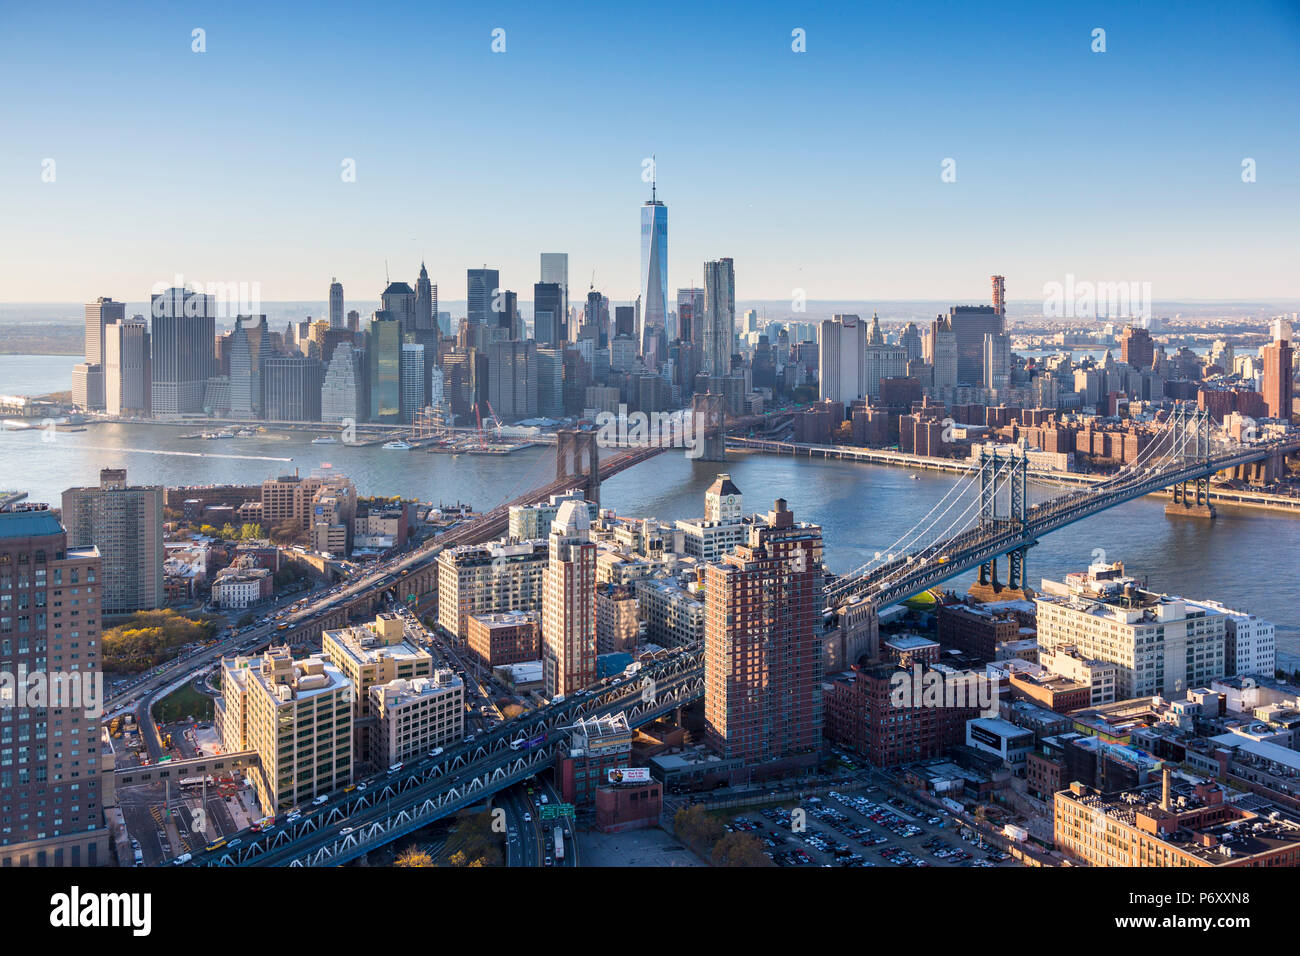 Le centre-ville de Manhattan et de Brooklyn, New York City, USA Photo Stock